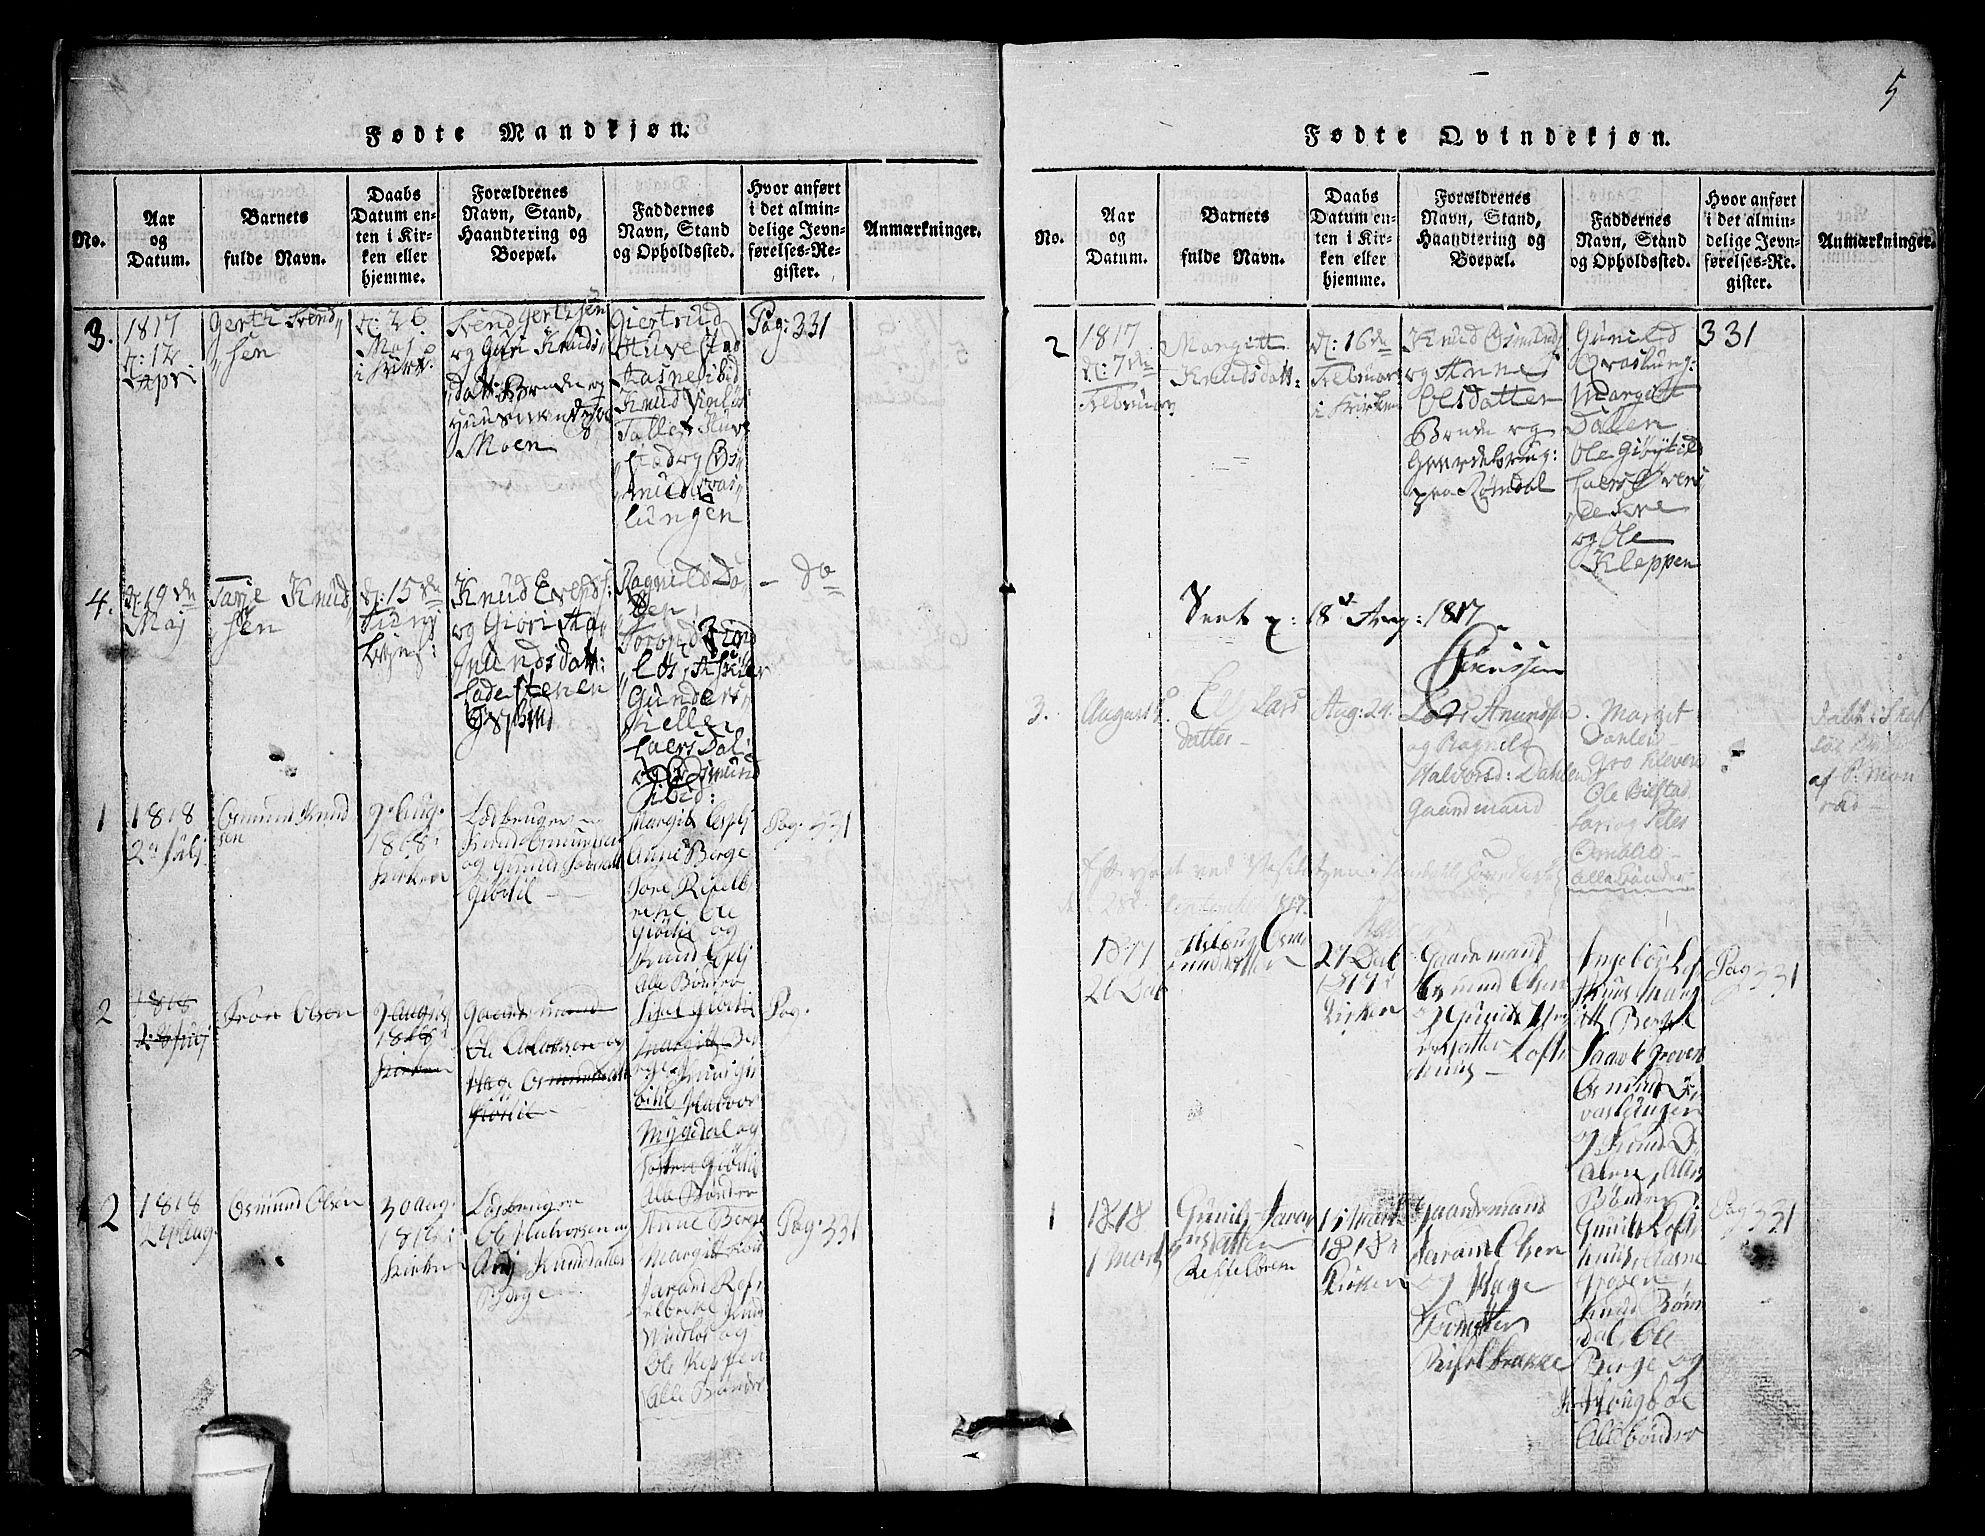 SAKO, Lårdal kirkebøker, G/Gb/L0001: Klokkerbok nr. II 1, 1815-1865, s. 5